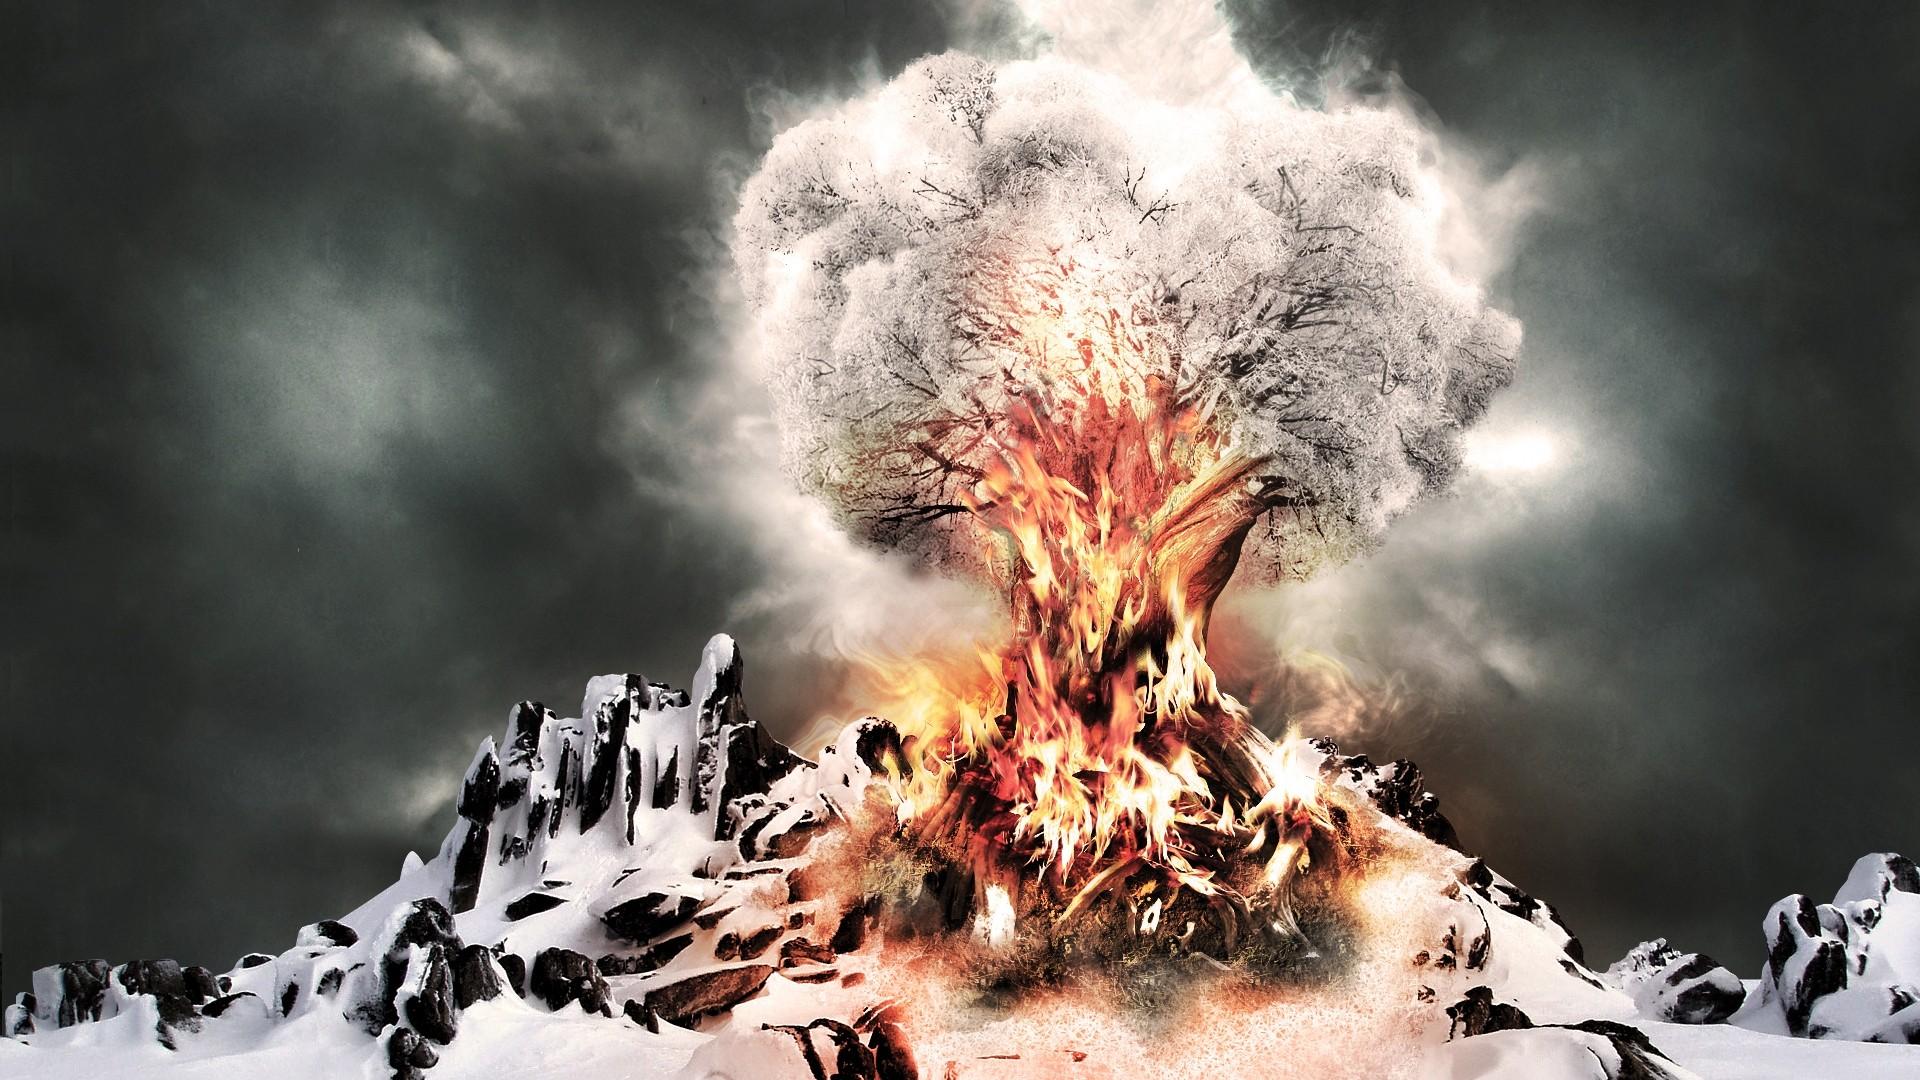 Explosion HD Wallpaper